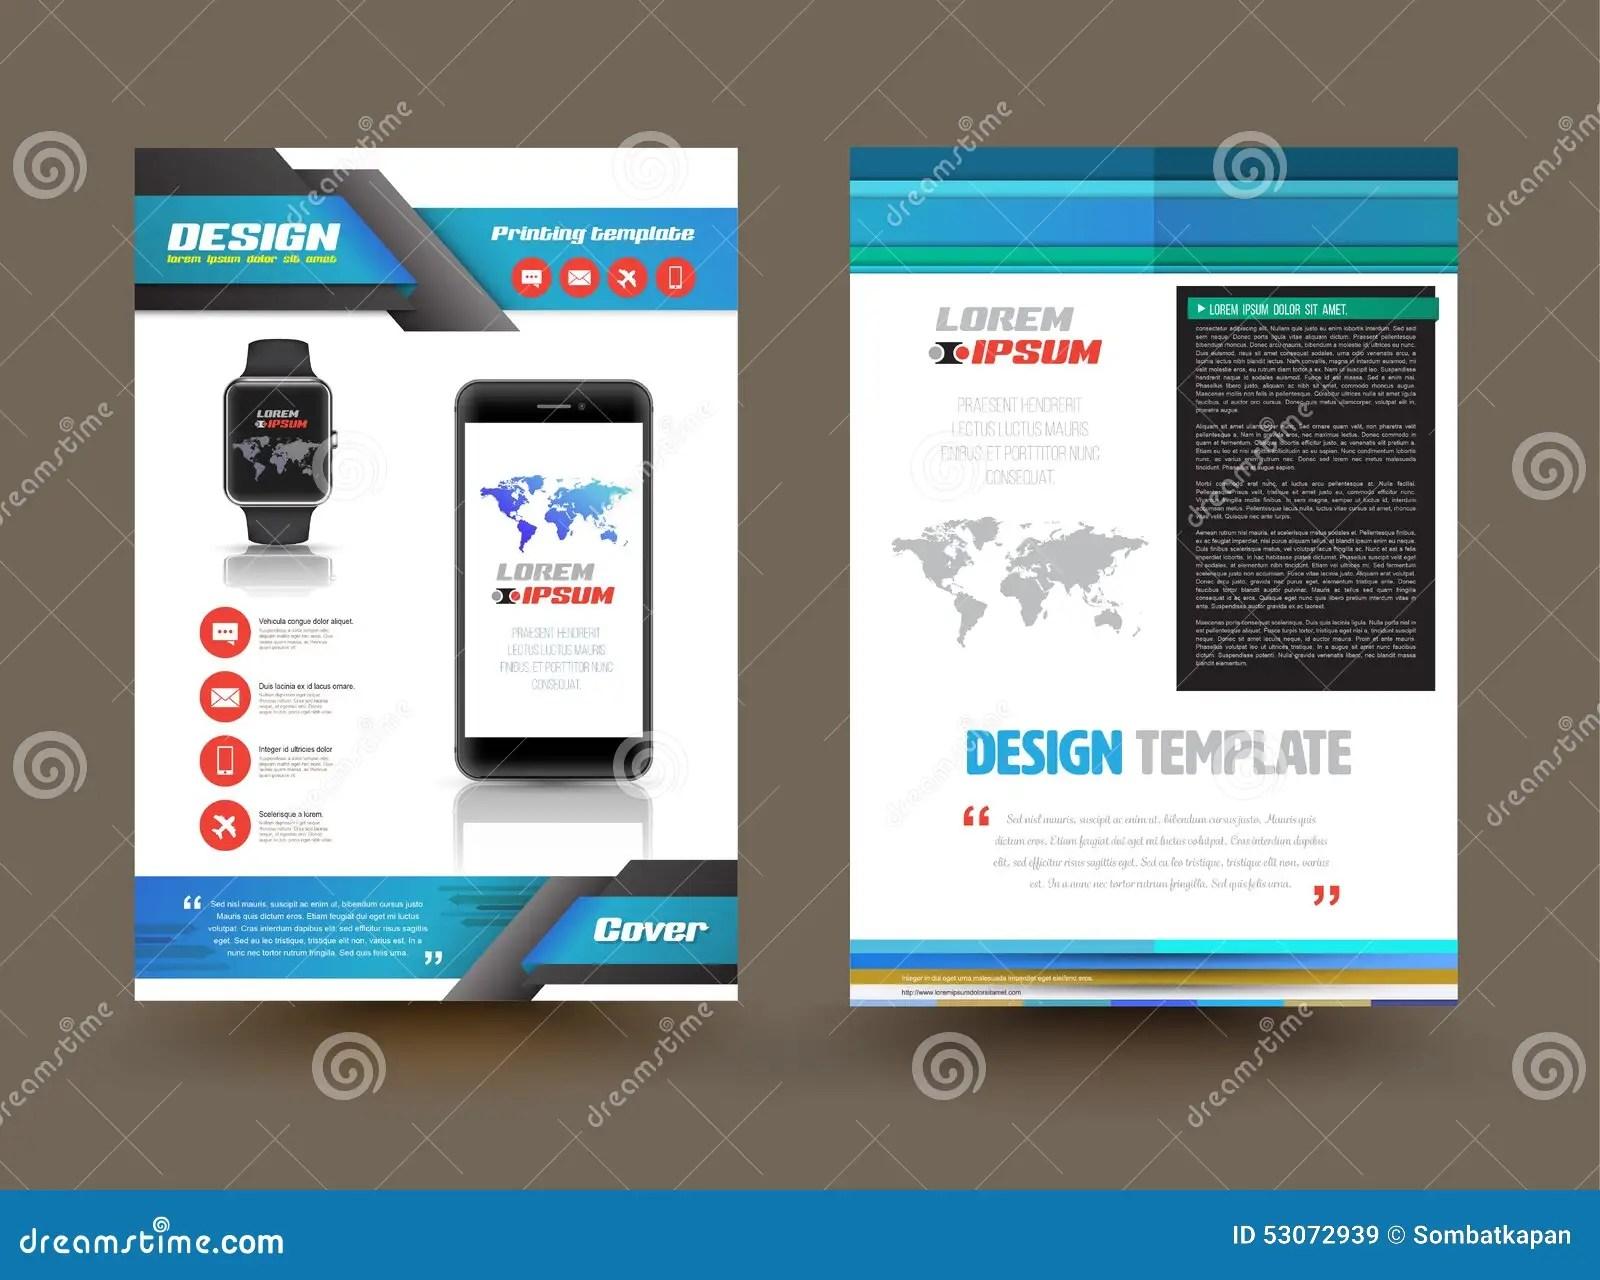 Sample Product Brochures - Ideal.vistalist.co - Brochure Design